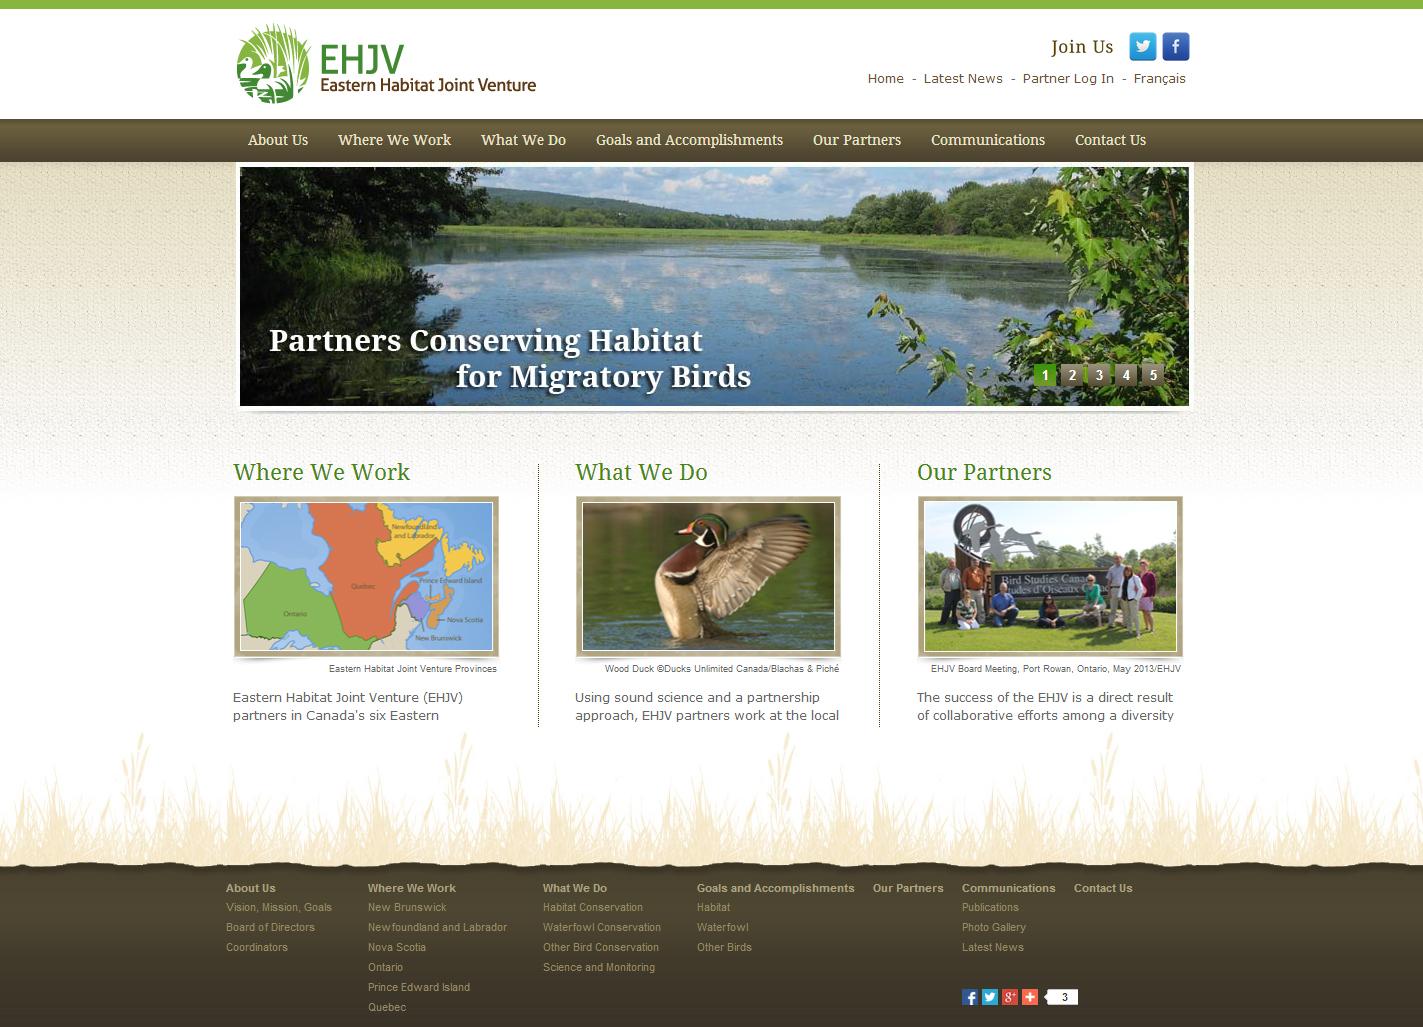 Eastern Habitat Joint Venture